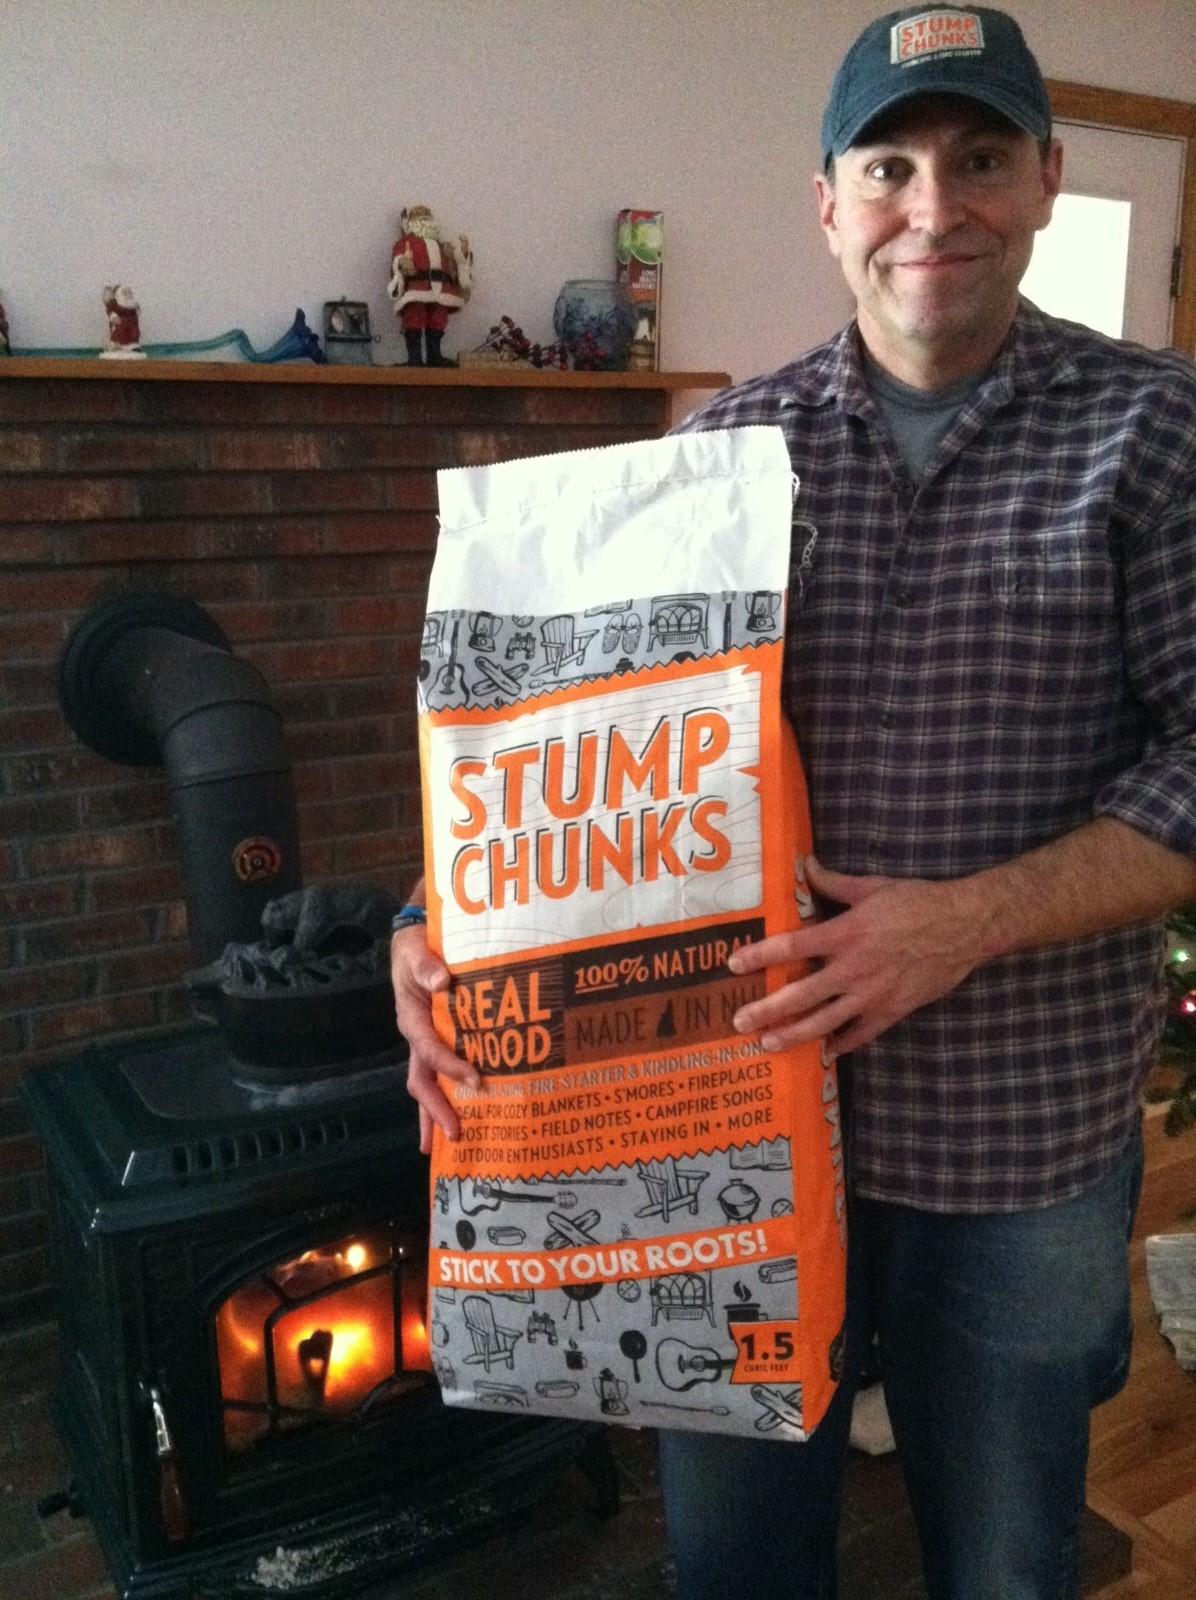 Stump Chunks December Large Bag and Hat Contest Winner